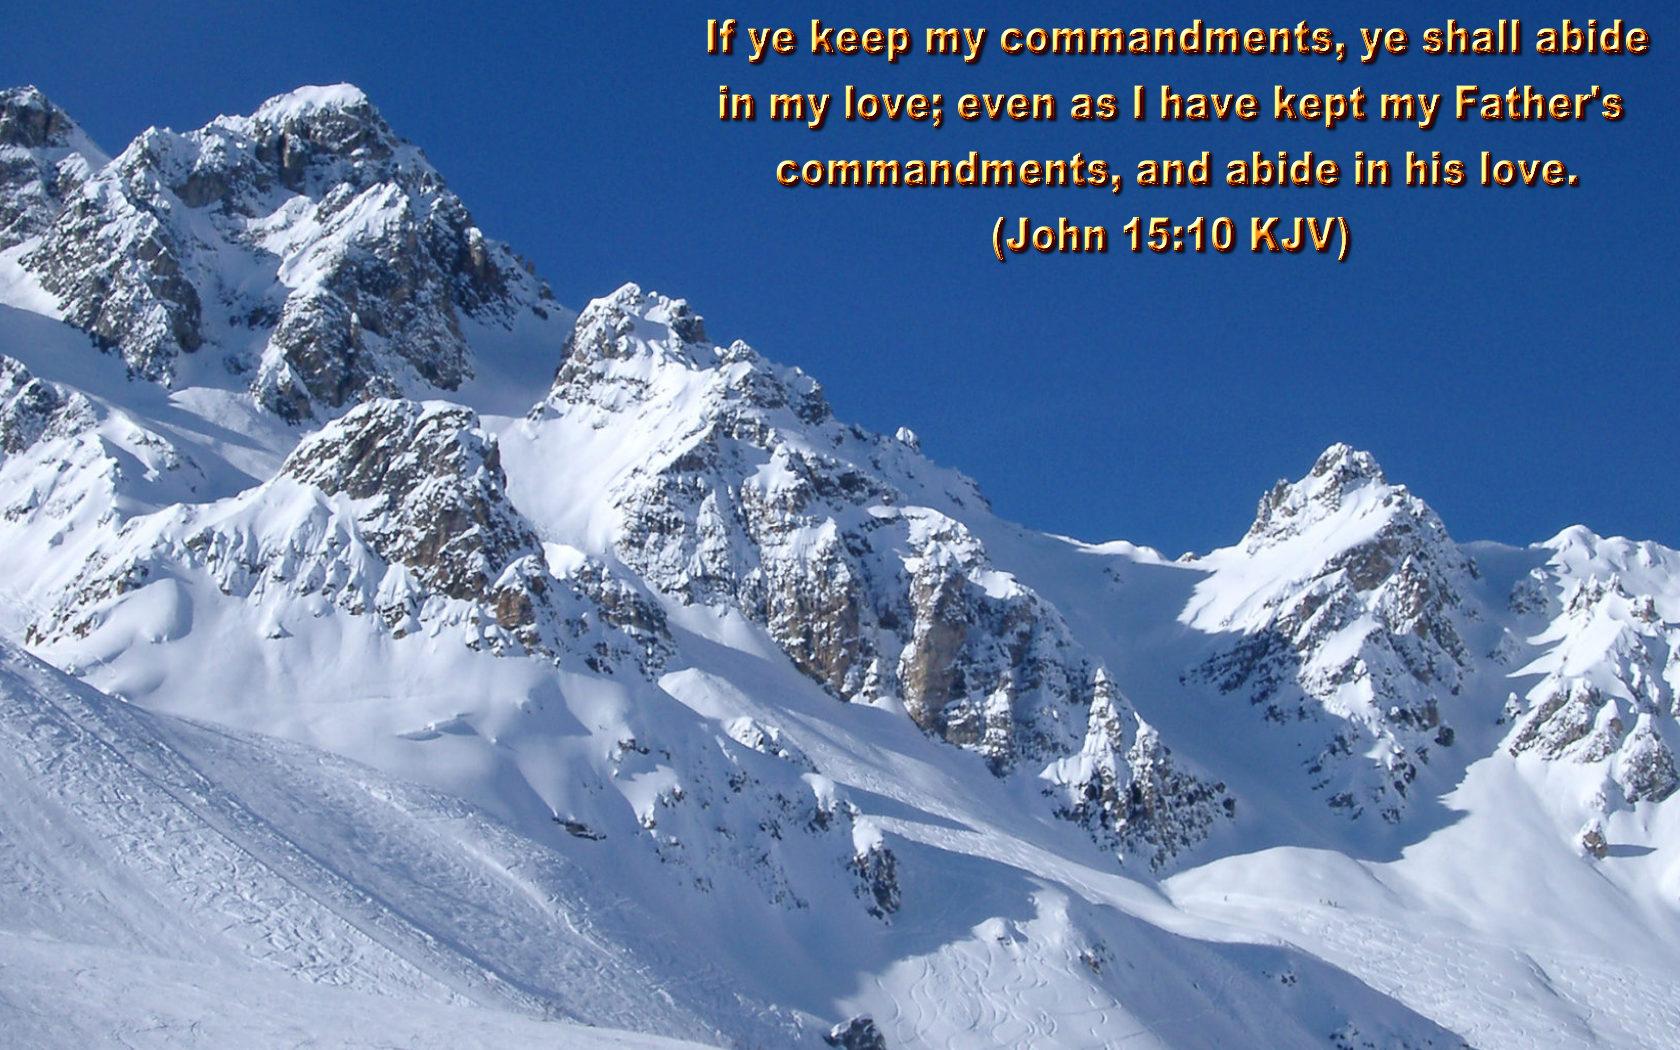 Christian Pictures with Bible Verses KJV By wwwturnbacktogodcom 1680x1050